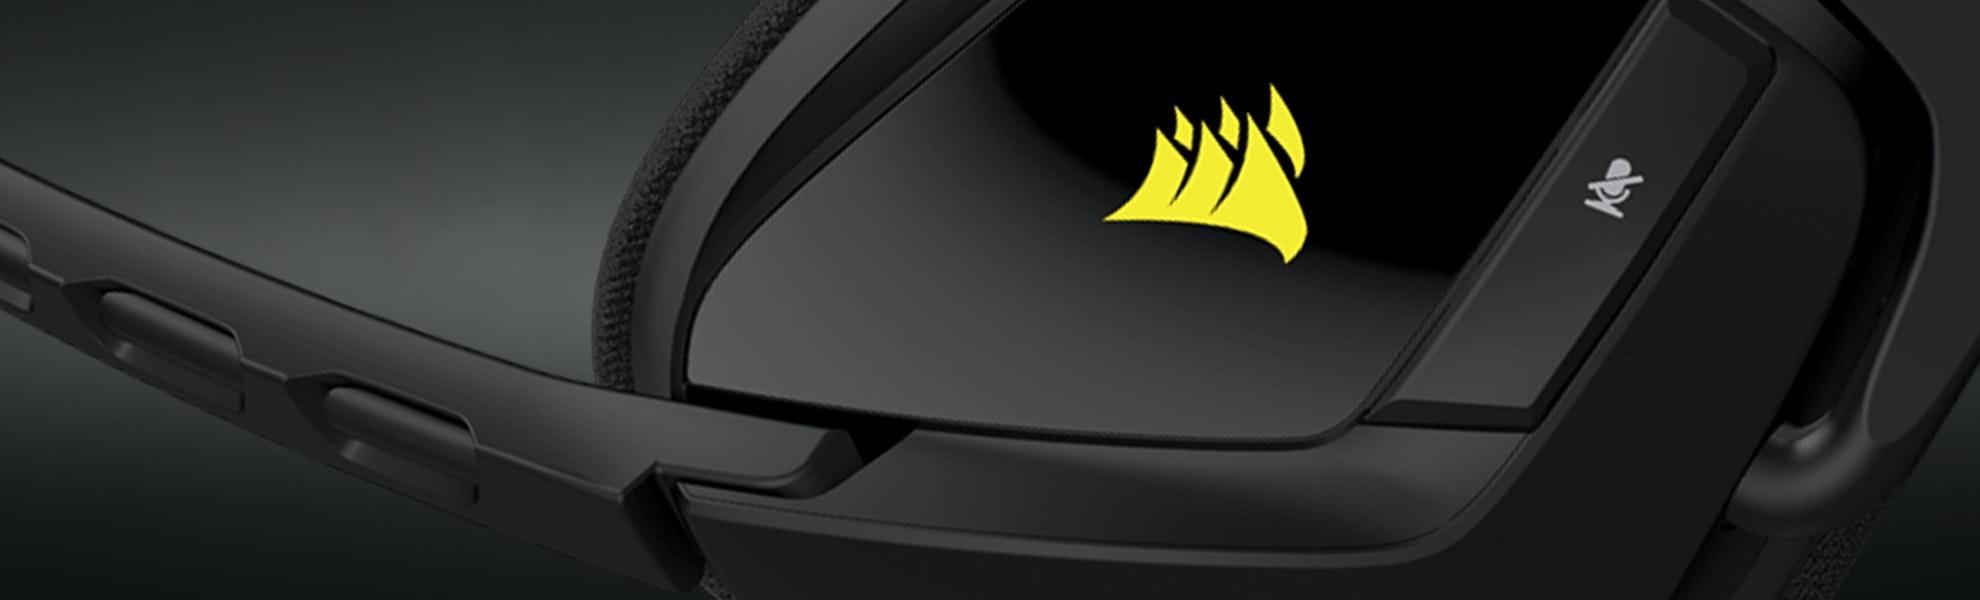 Corsair Void Wireless RGB Gaming Heaset